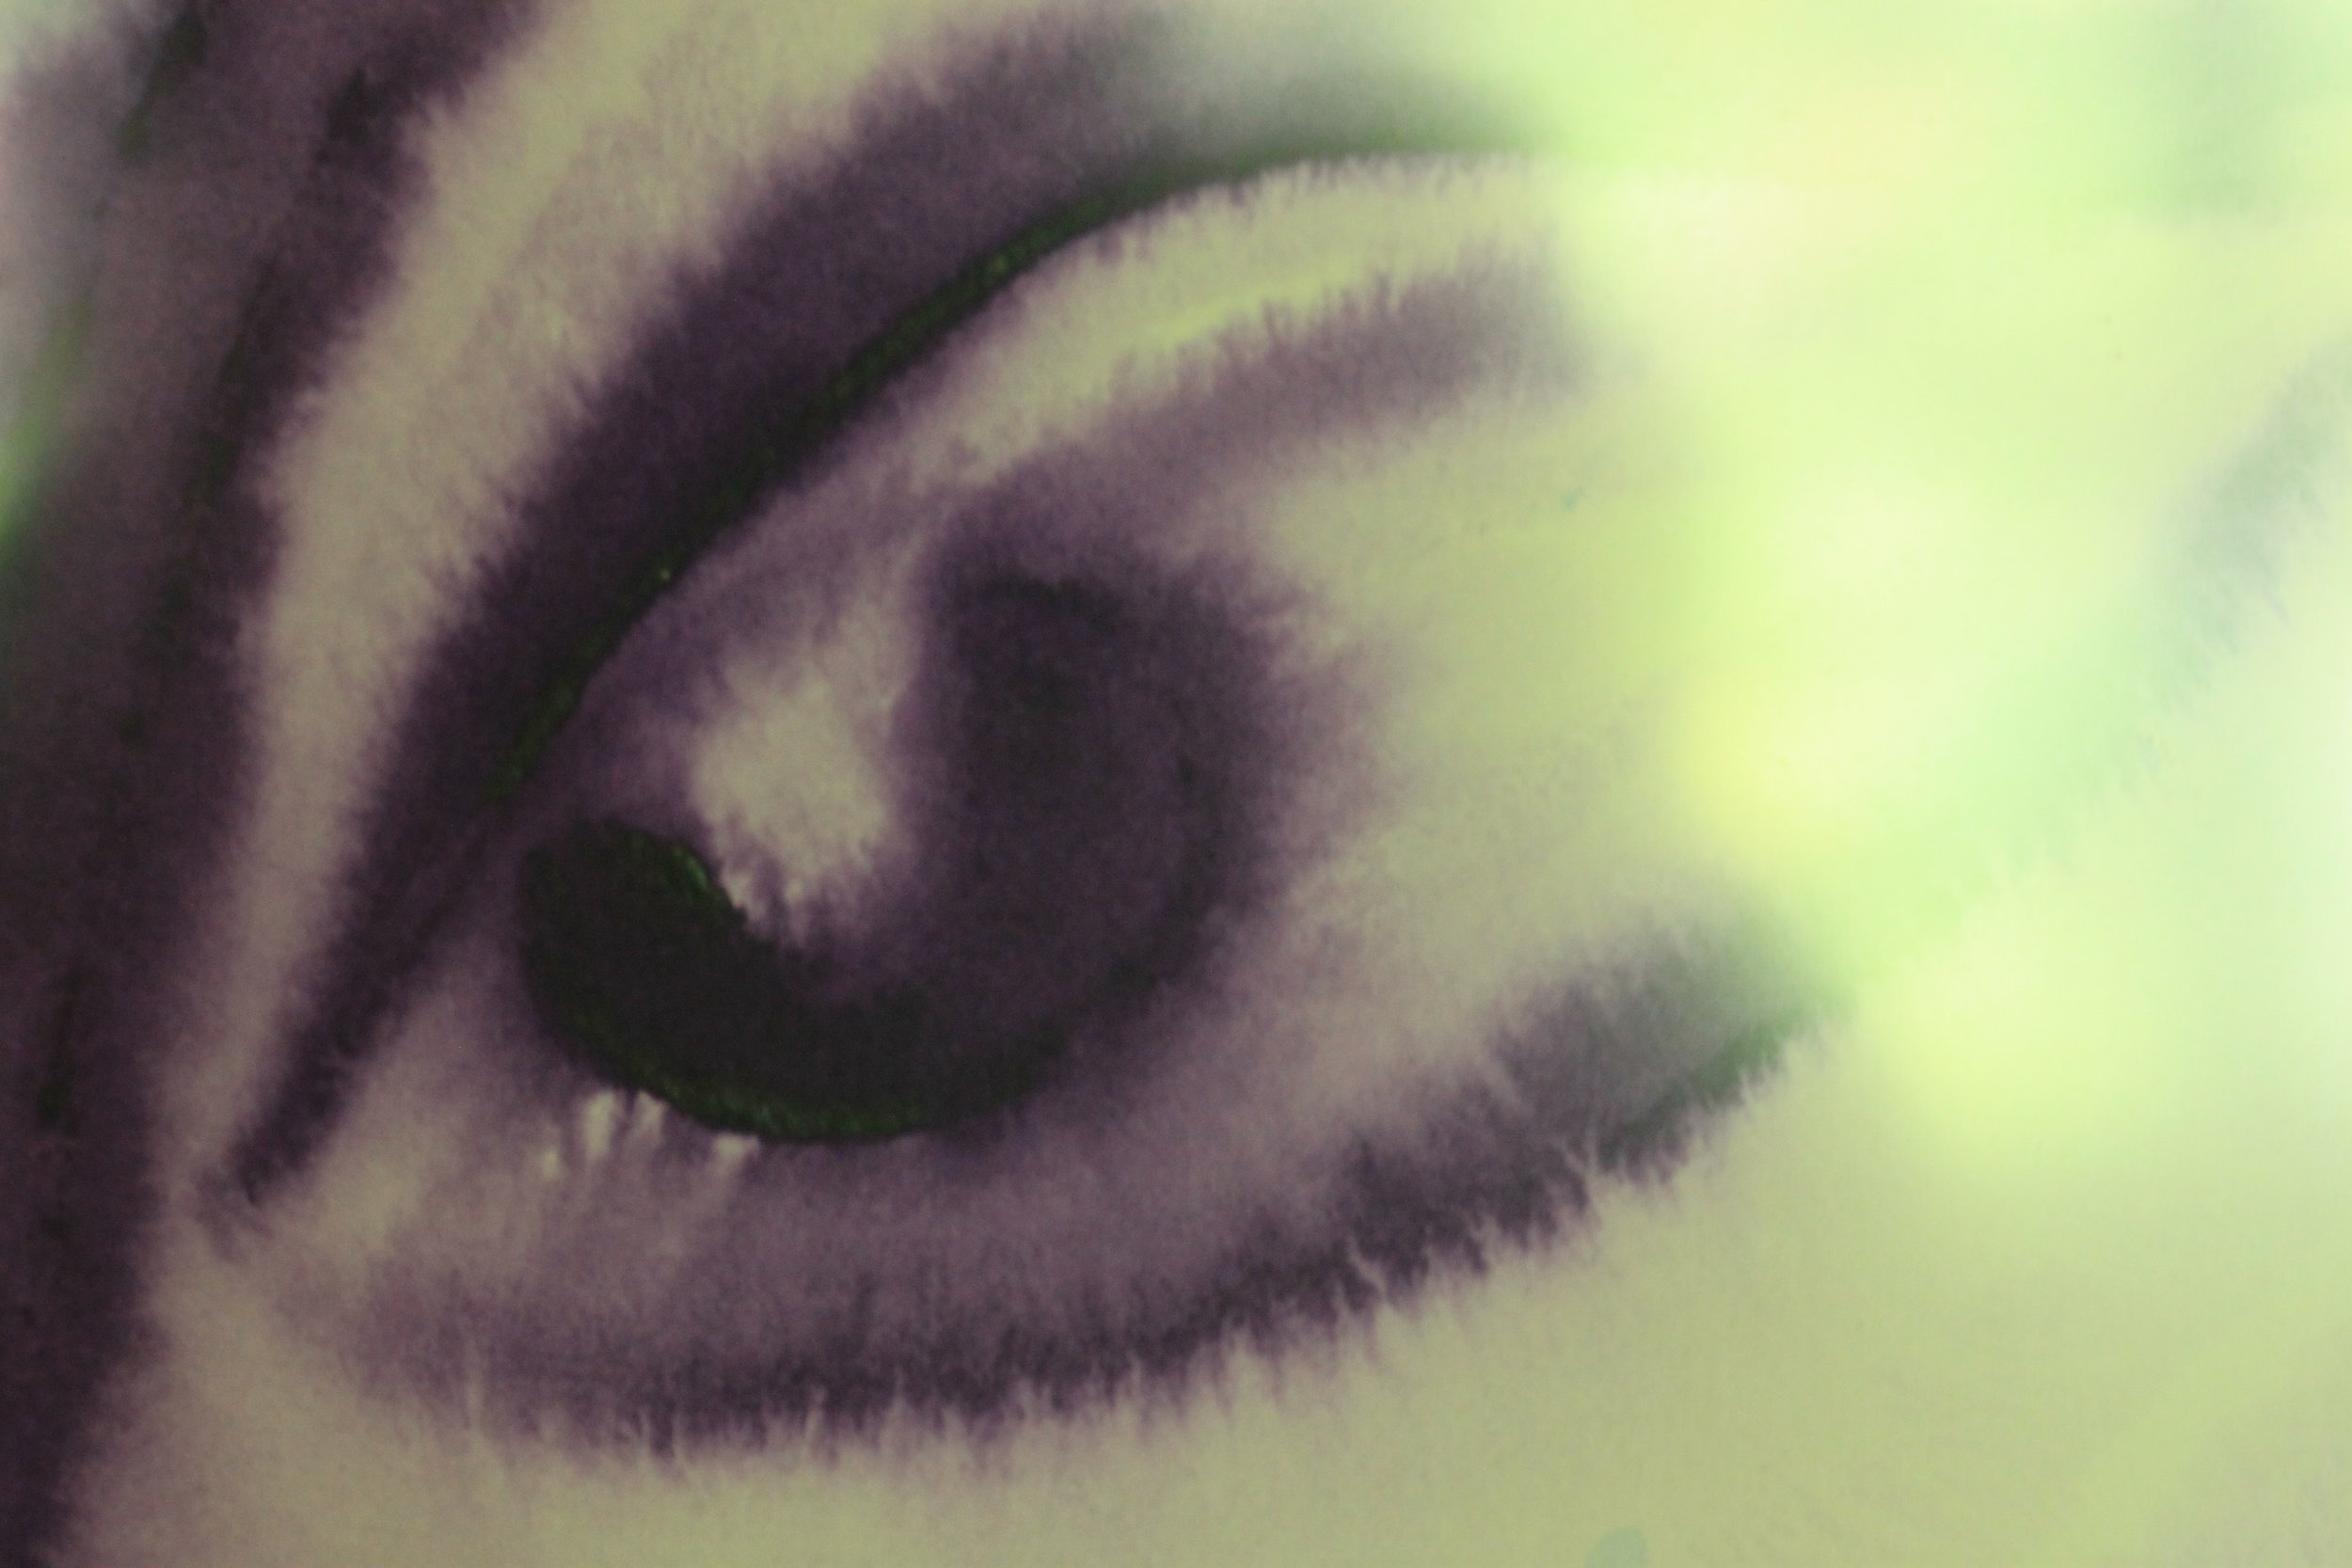 Cosmic Eye photo by Daniel Atchison-Nevel